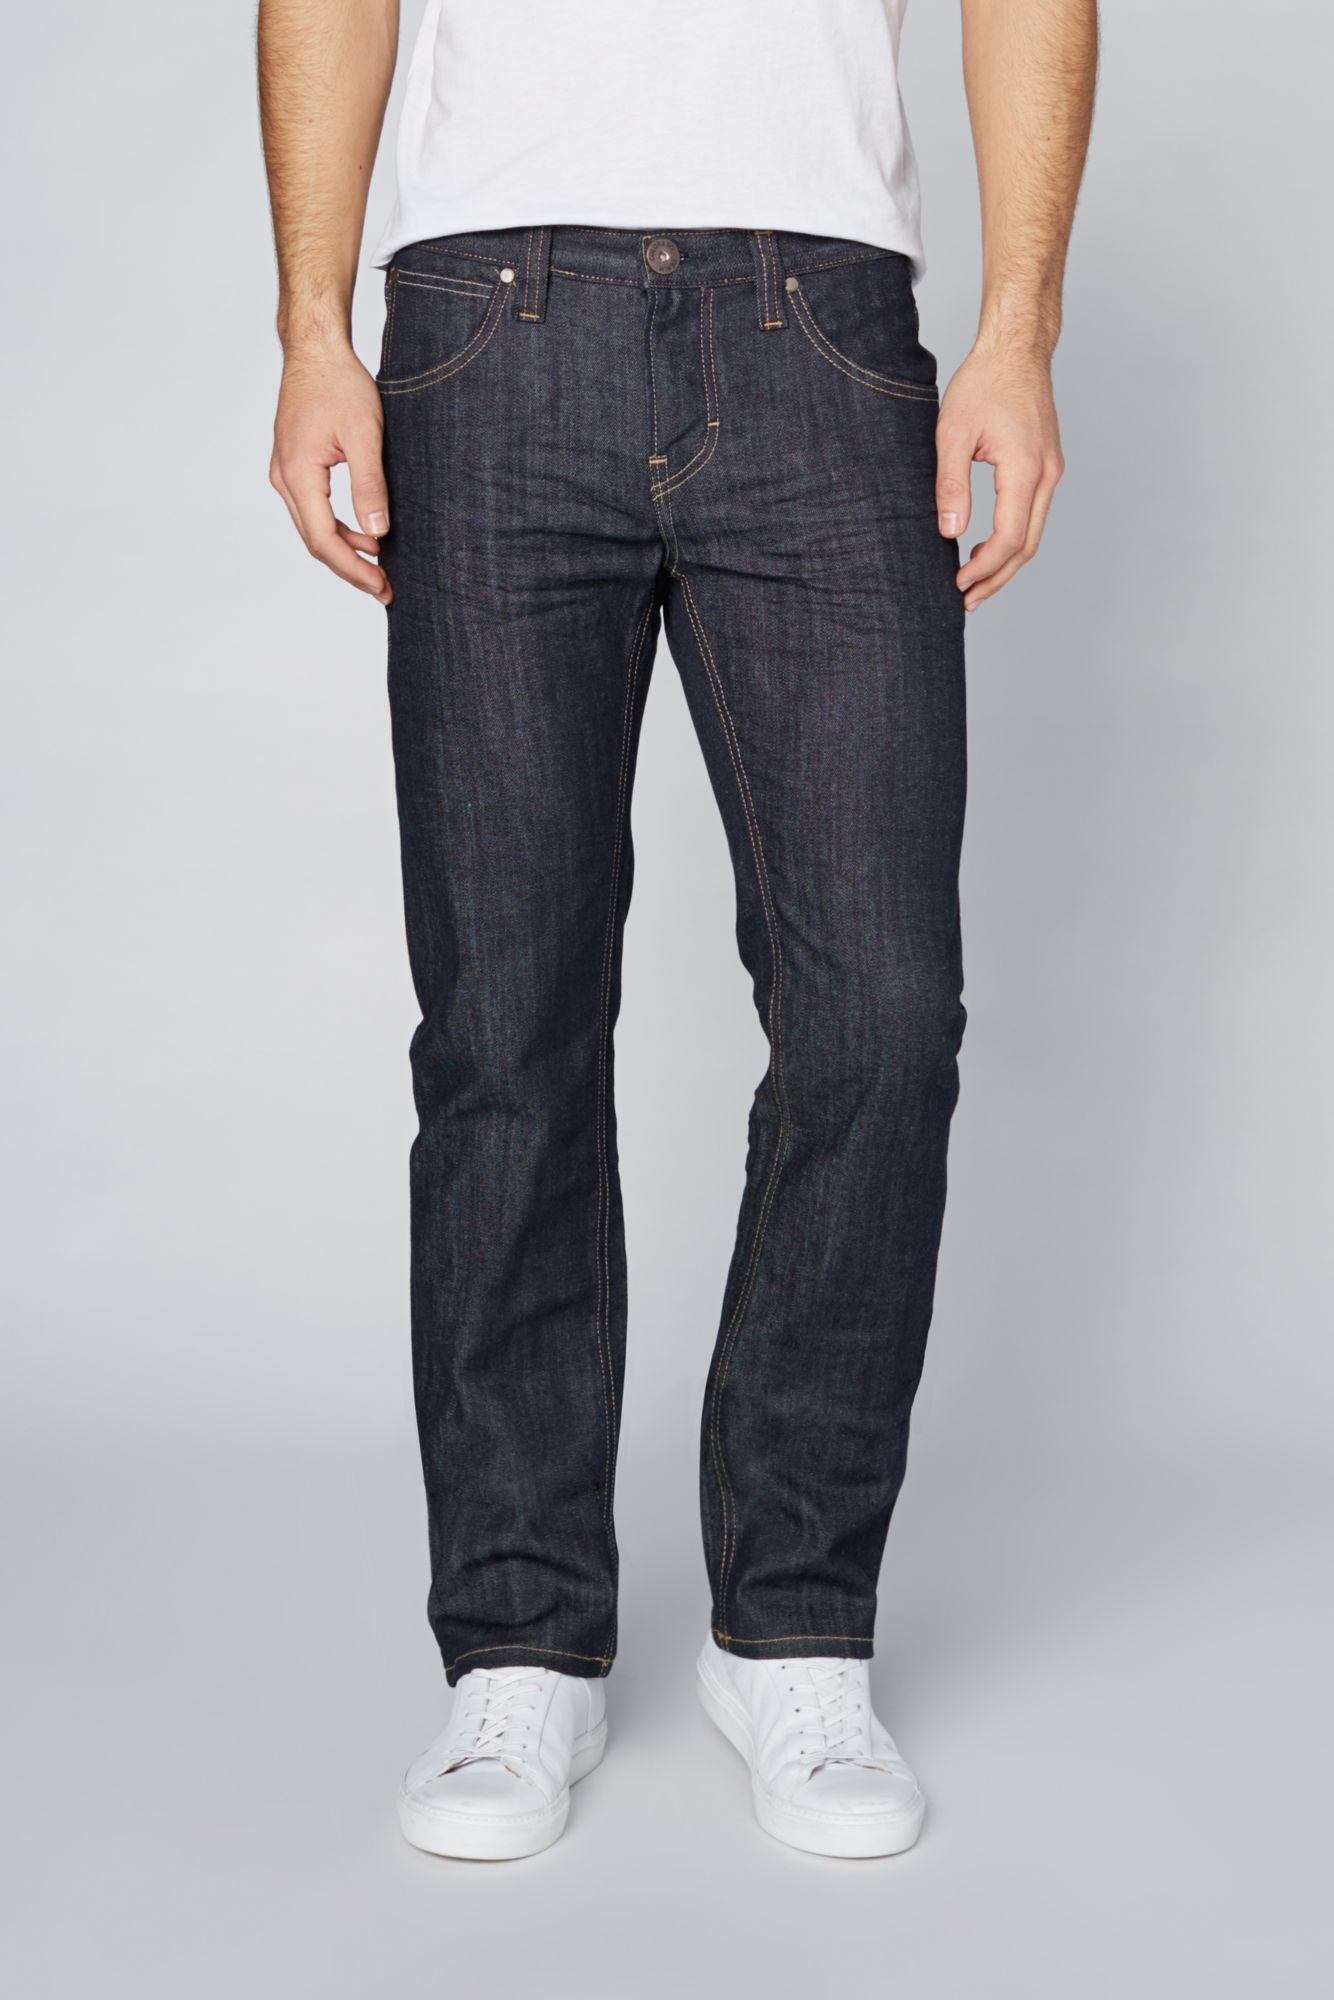 COLORADO DENIM  Jeans »C942 LUKE Herren Jeans«